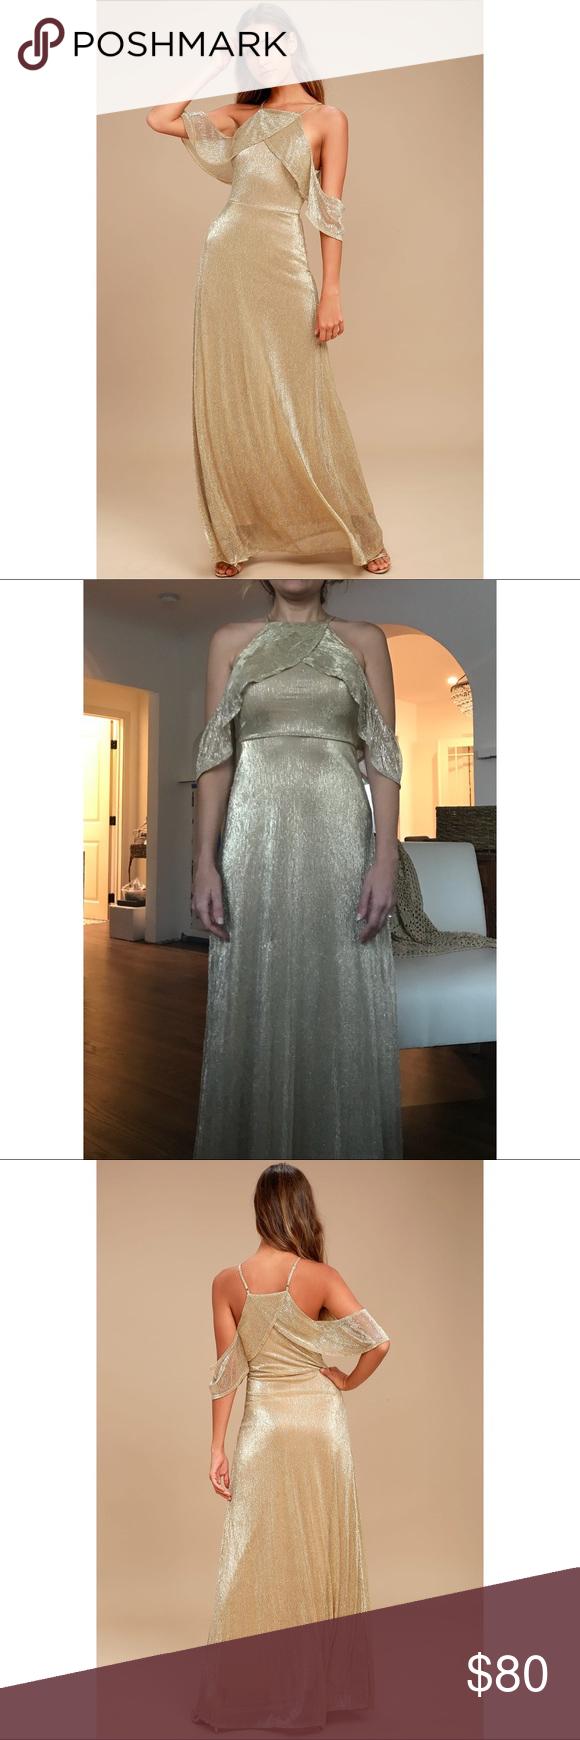 Shine bright gold off the shoulder maxi dress in my posh